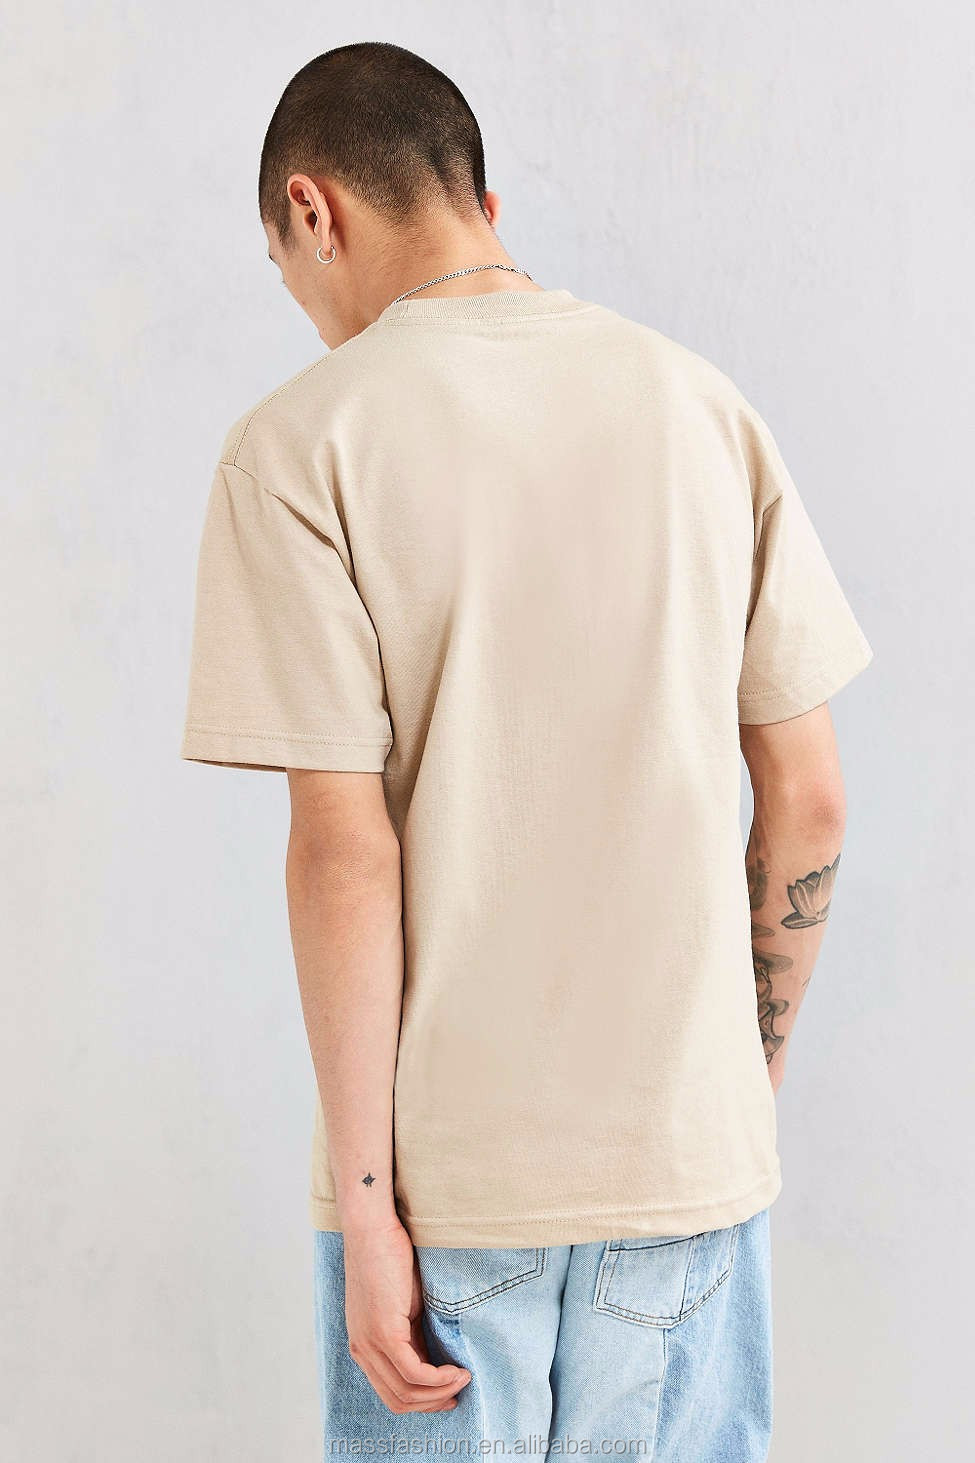 Wholesale Mens Blank Plain Tee Shirt Longline Extended Man T Tendencies Tshirt Super Rock Putih S 15 16 17